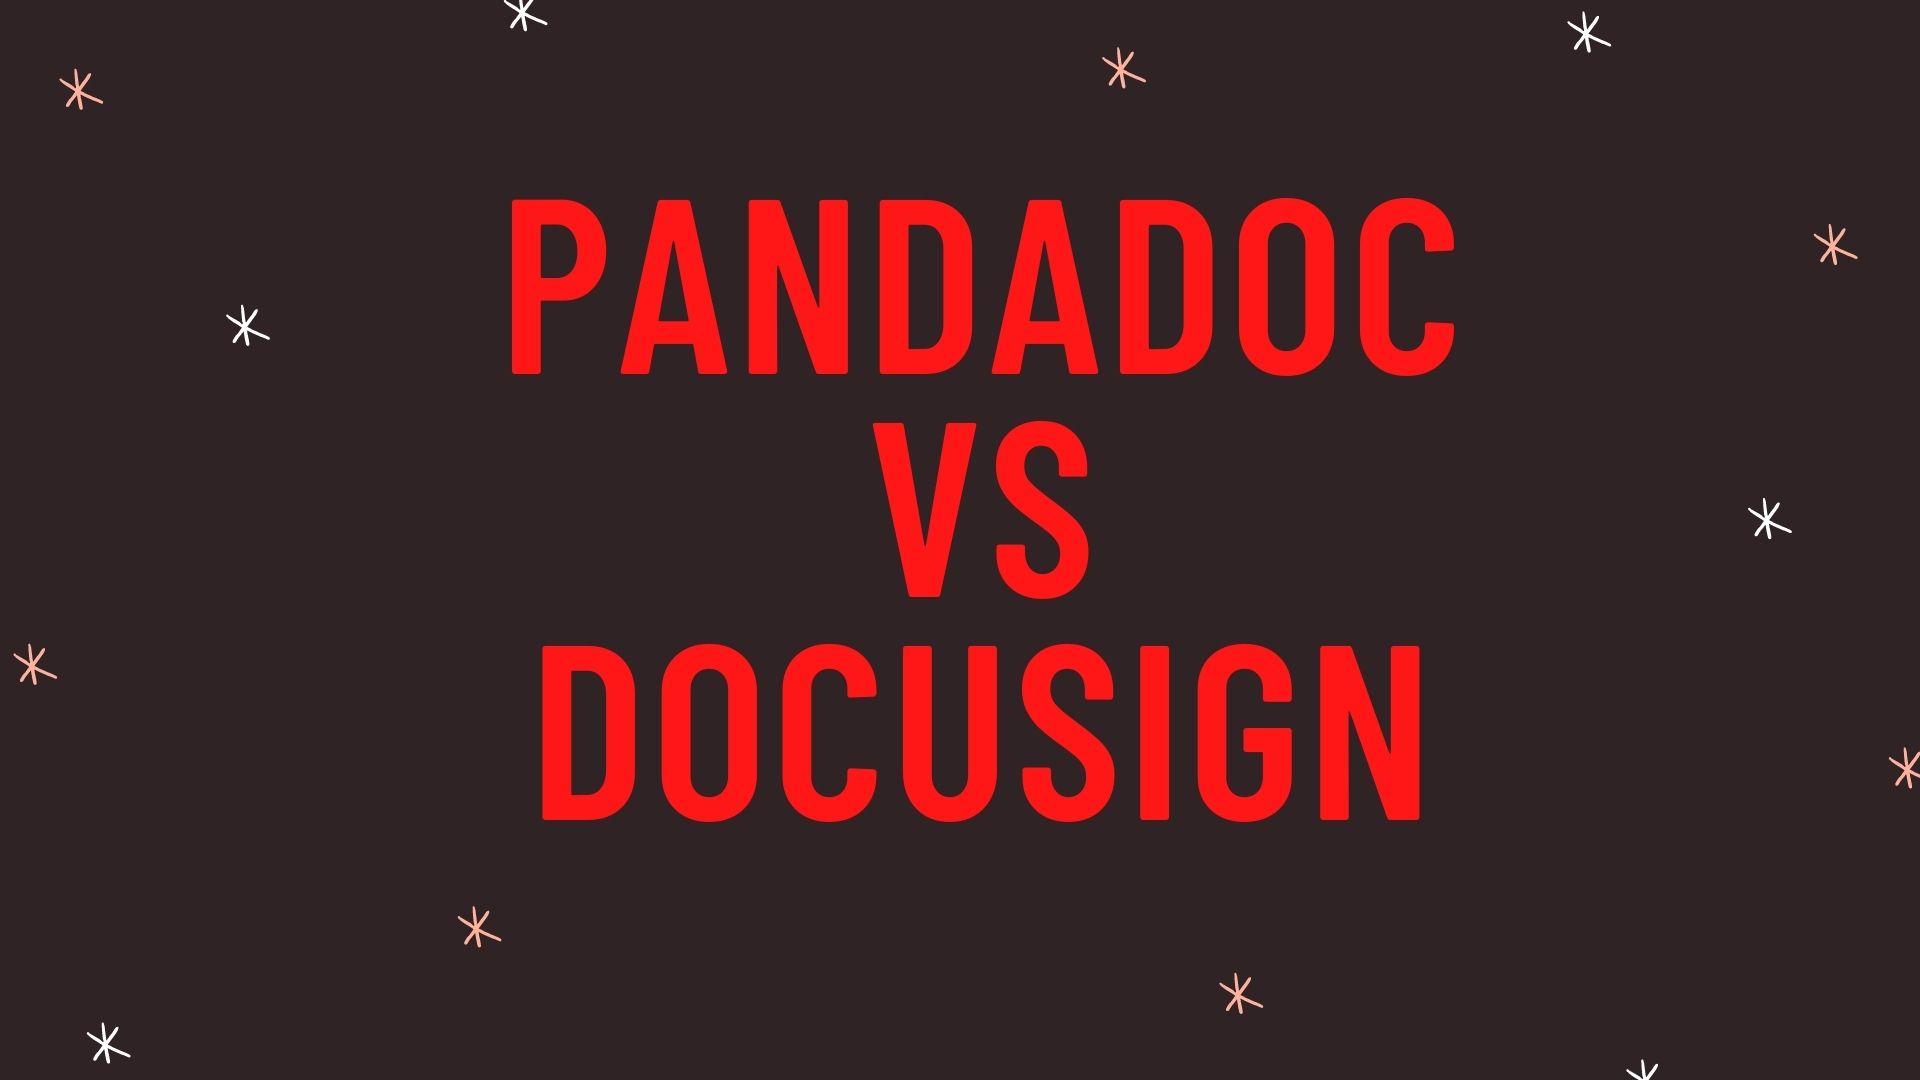 PandaDoc vs DocuSign